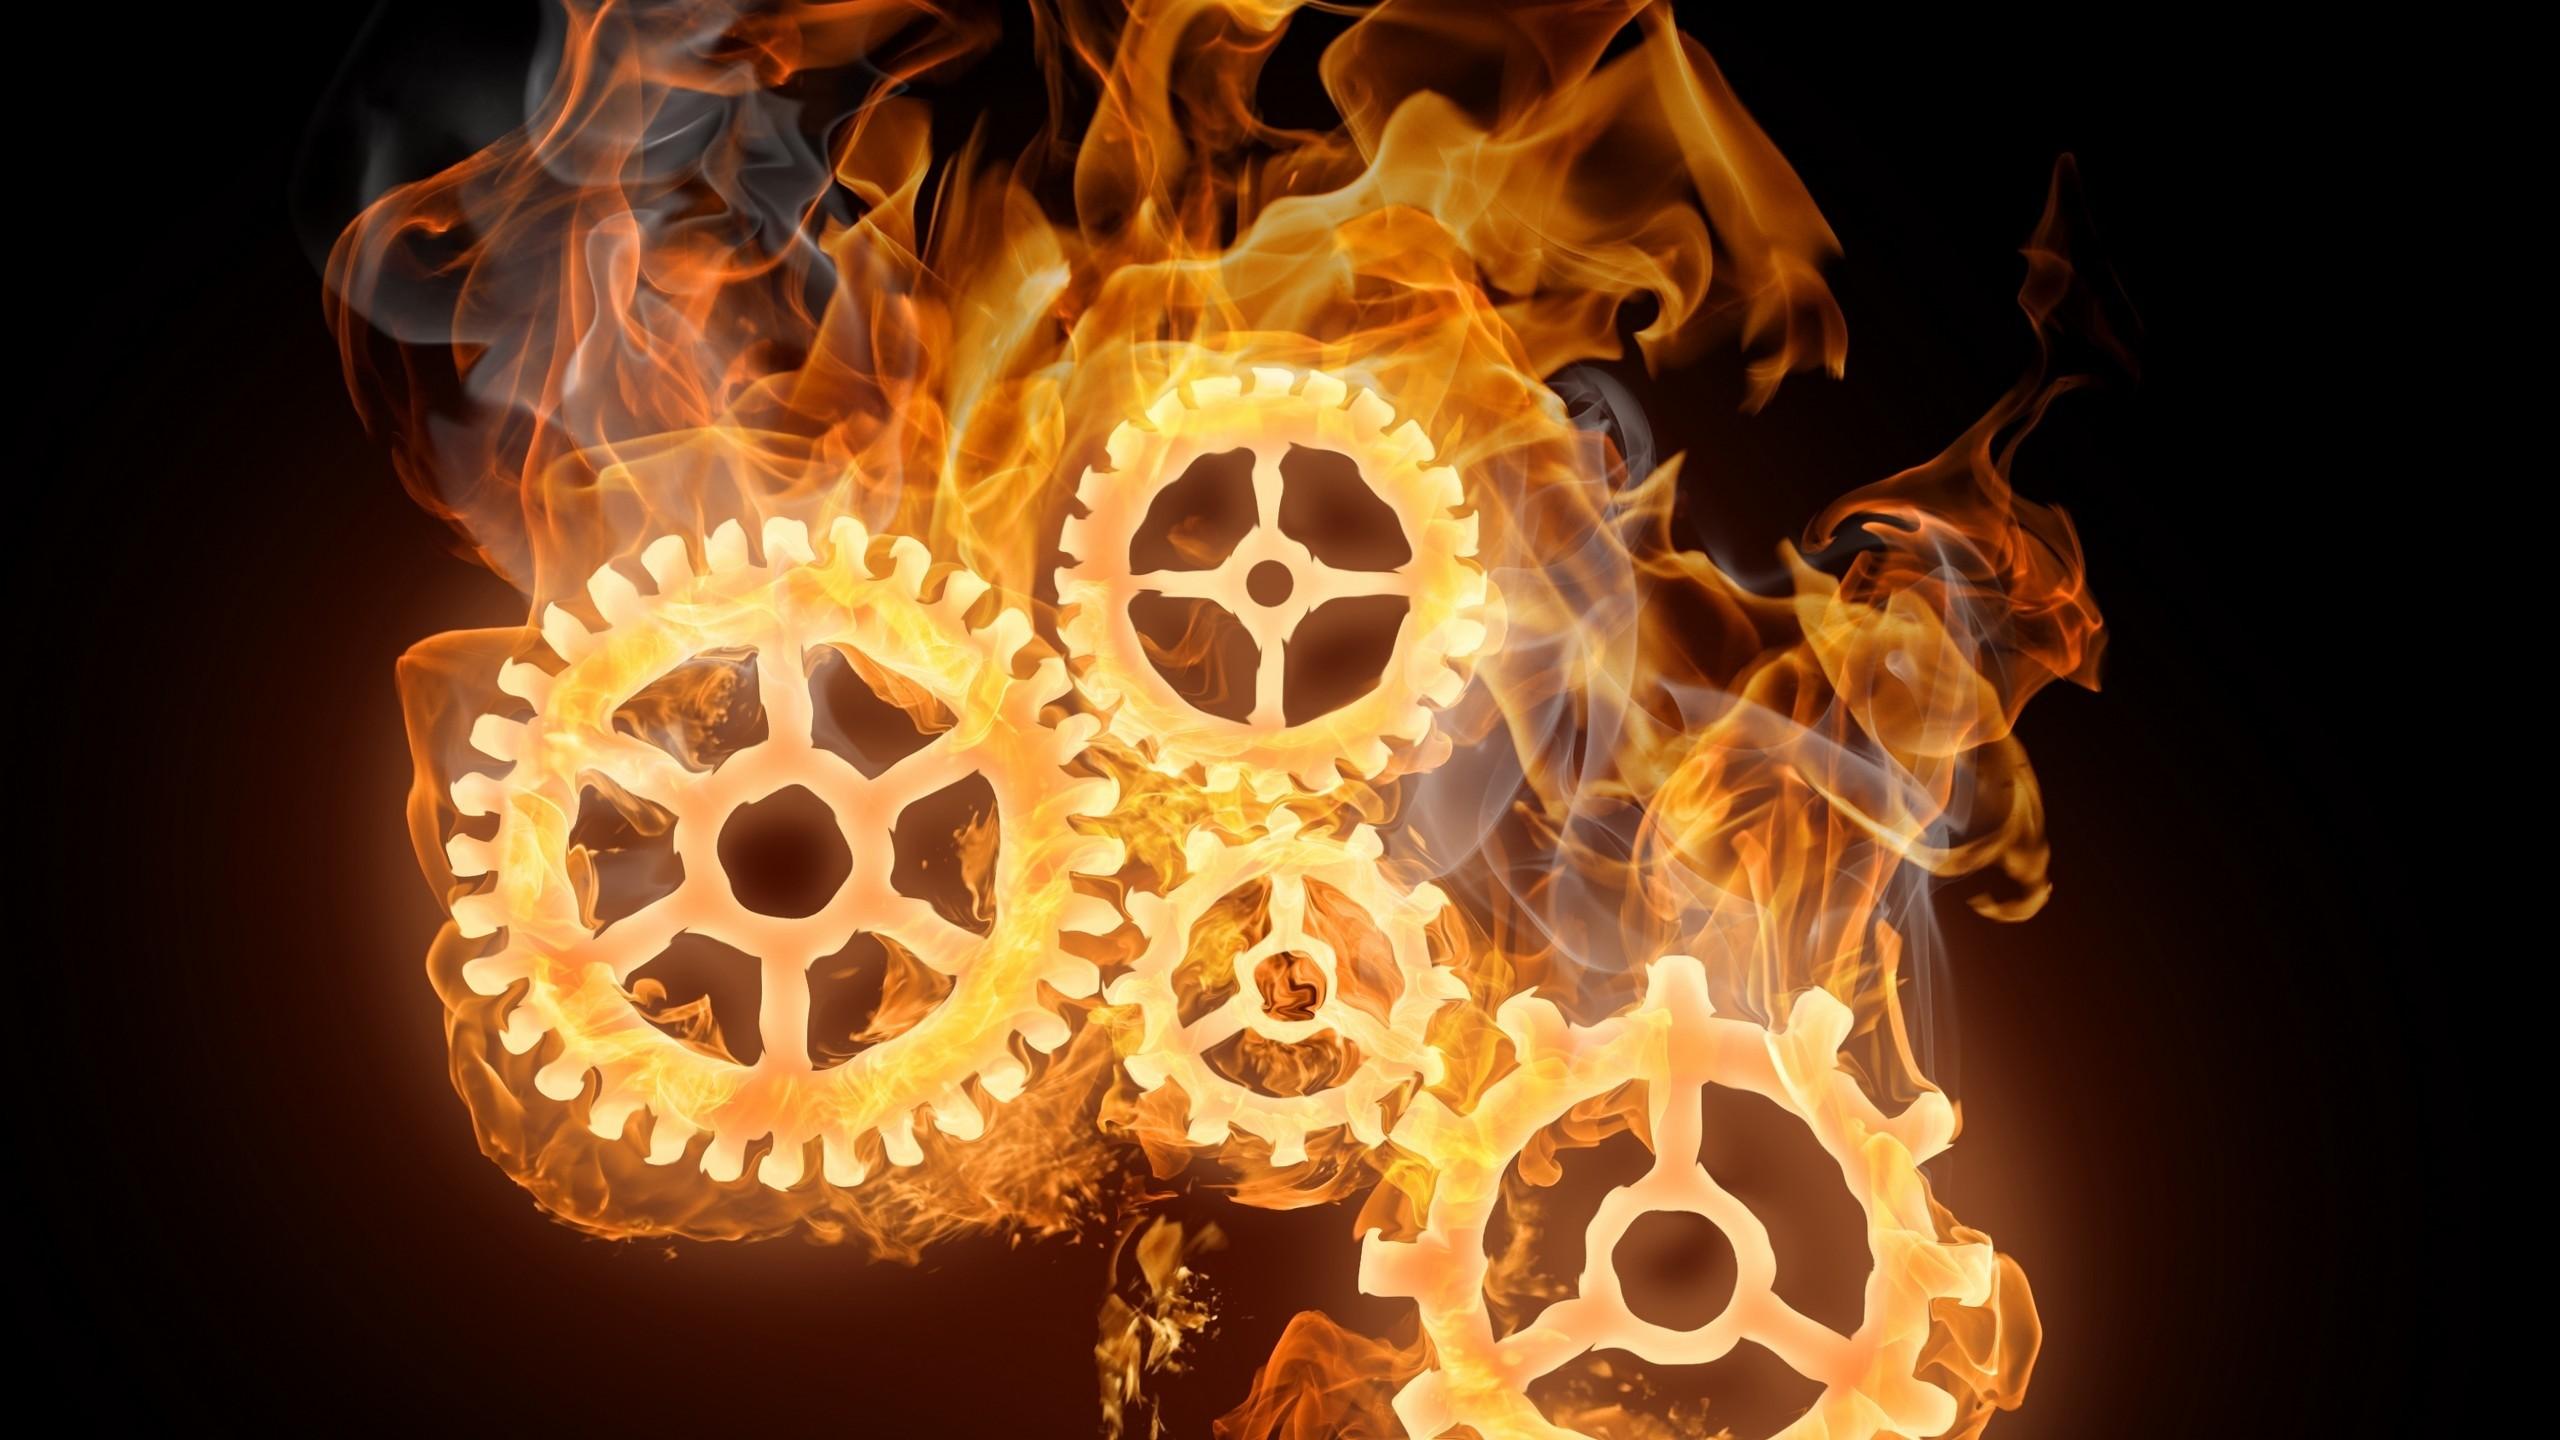 3D Fire Wallpaper (57+ images)